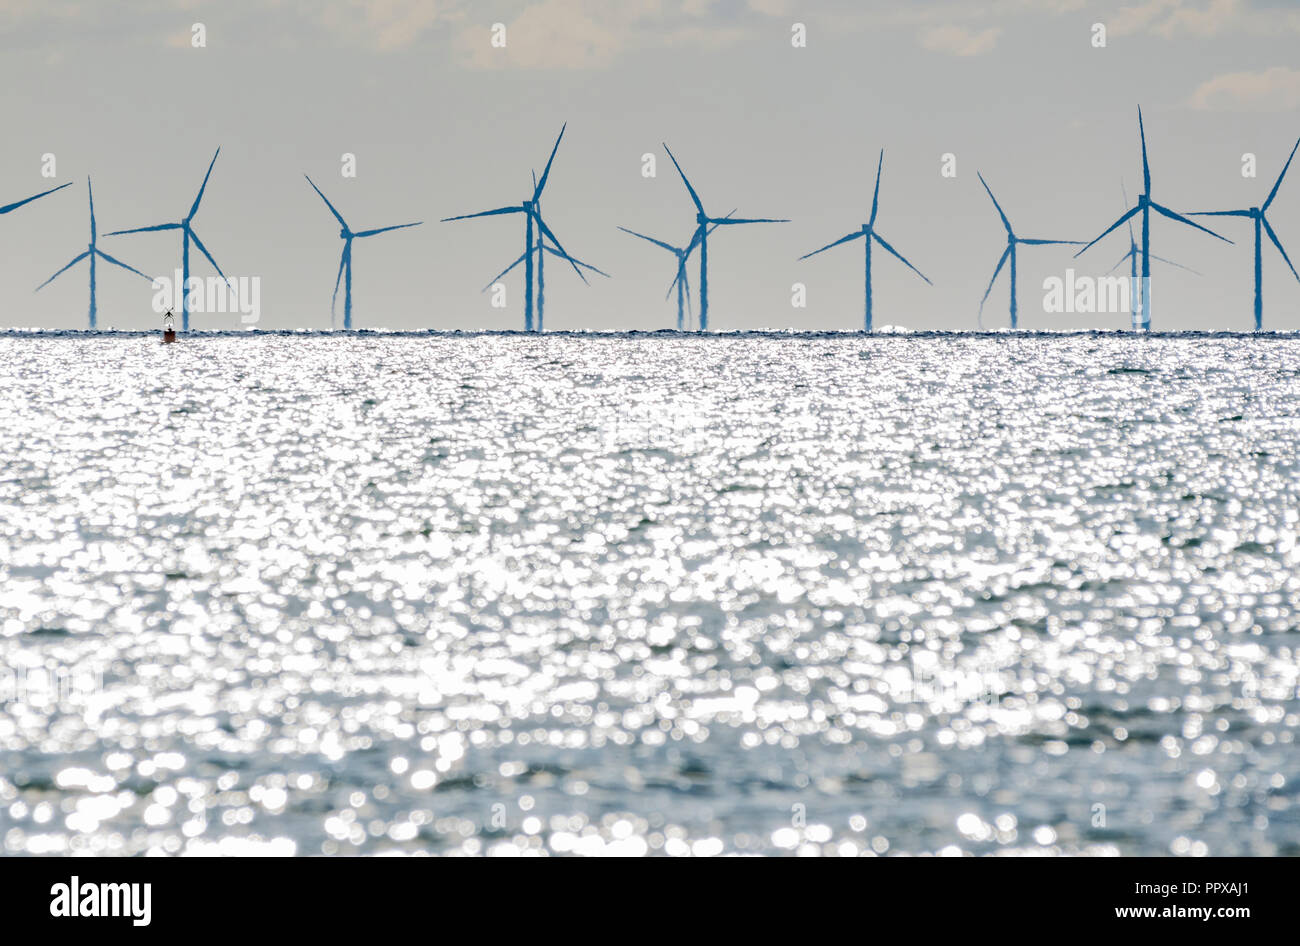 Rampion Wind Farm turbines in the sea off the South Coast of England, UK. Renewable green energy. - Stock Image